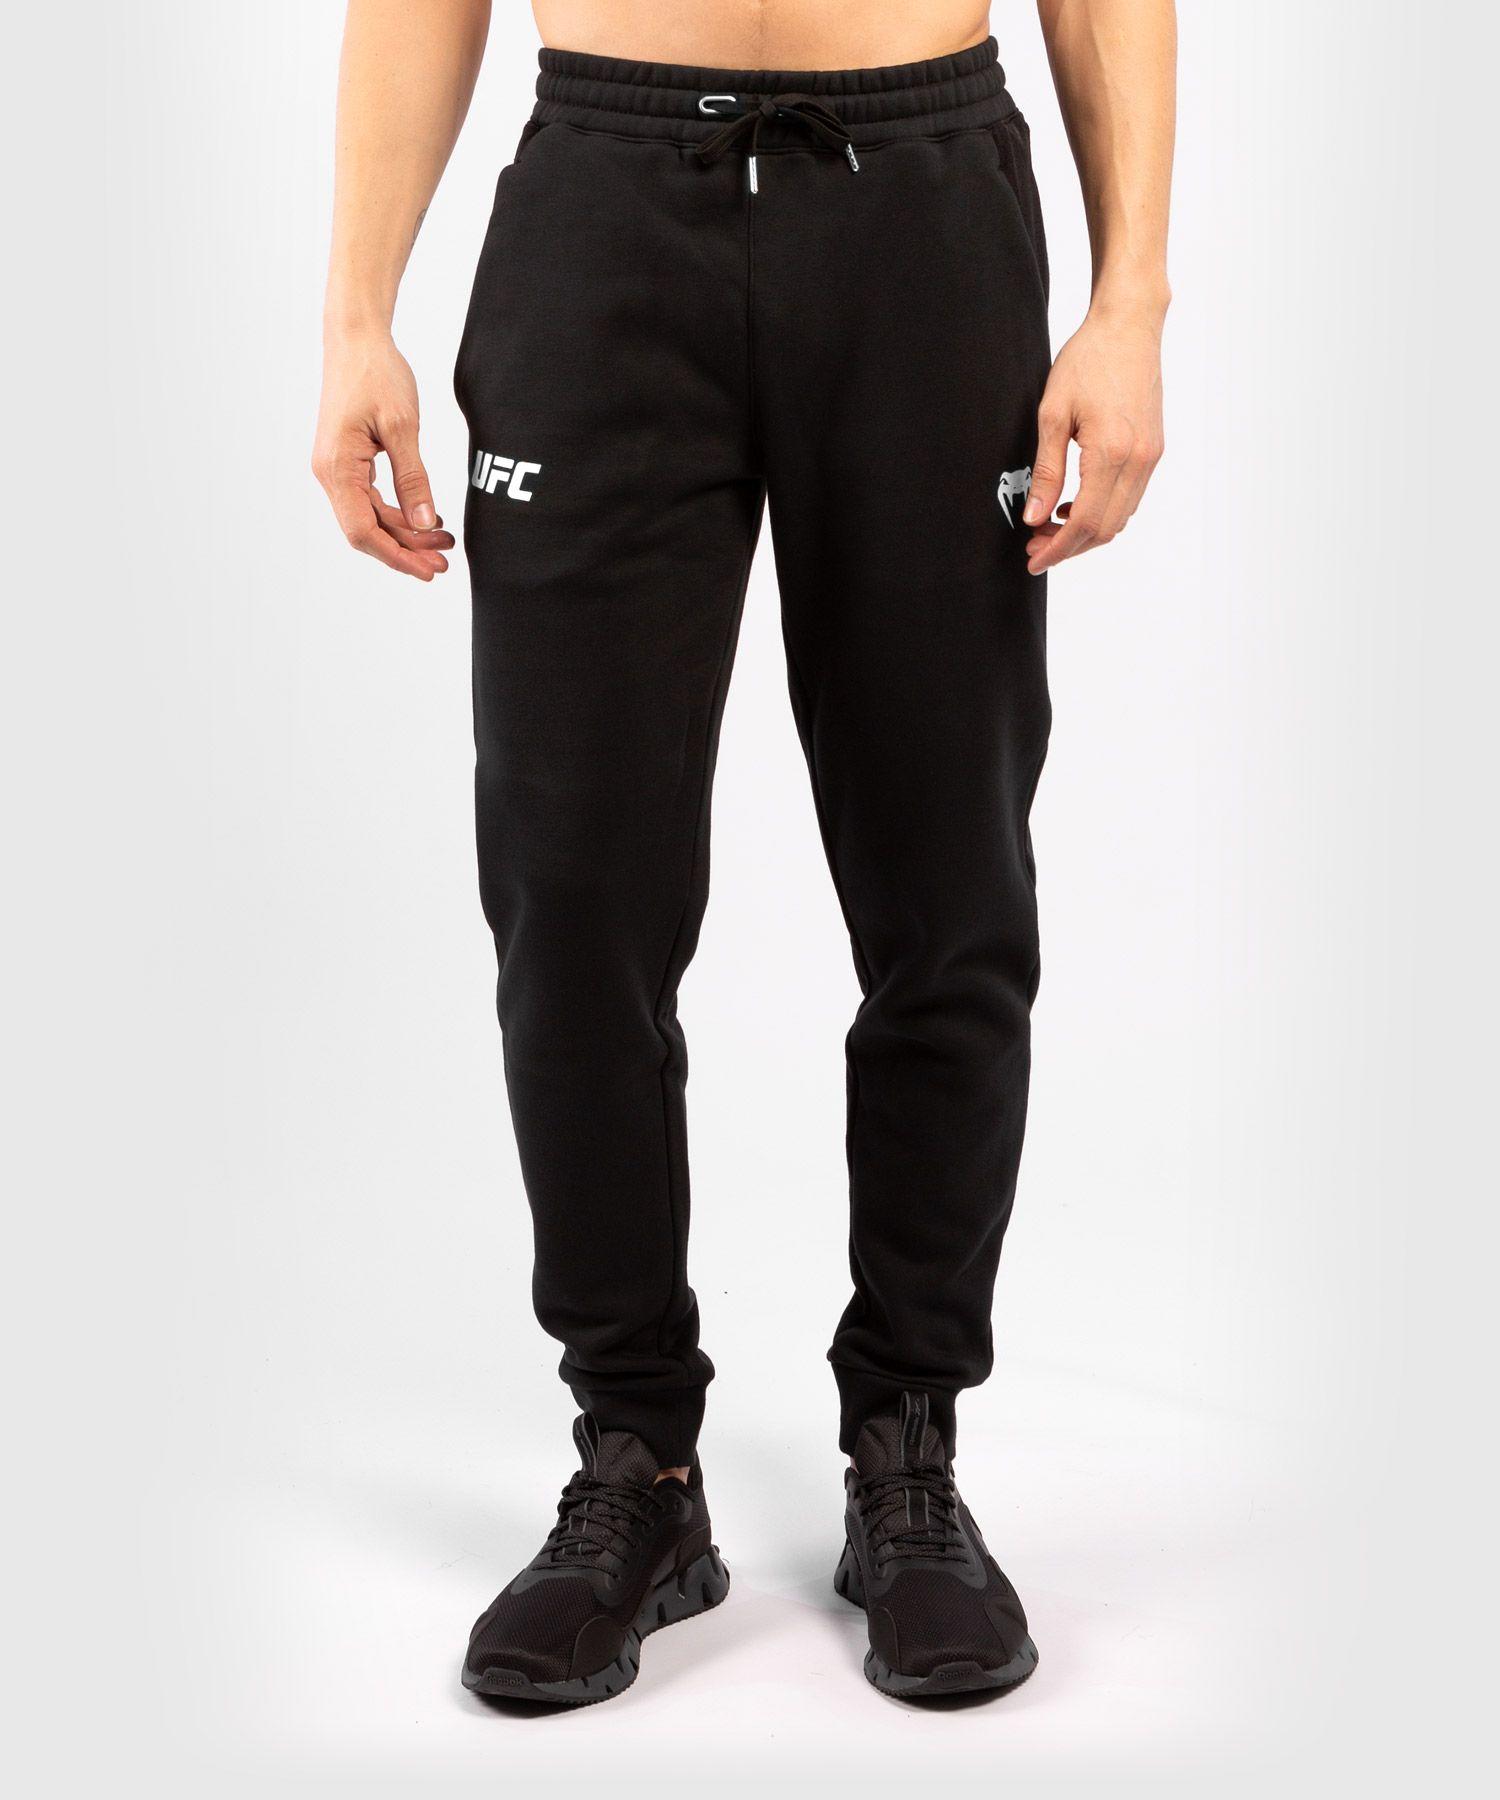 Pantaloni da Jogging Uomo UFC Venum Replica - Nero